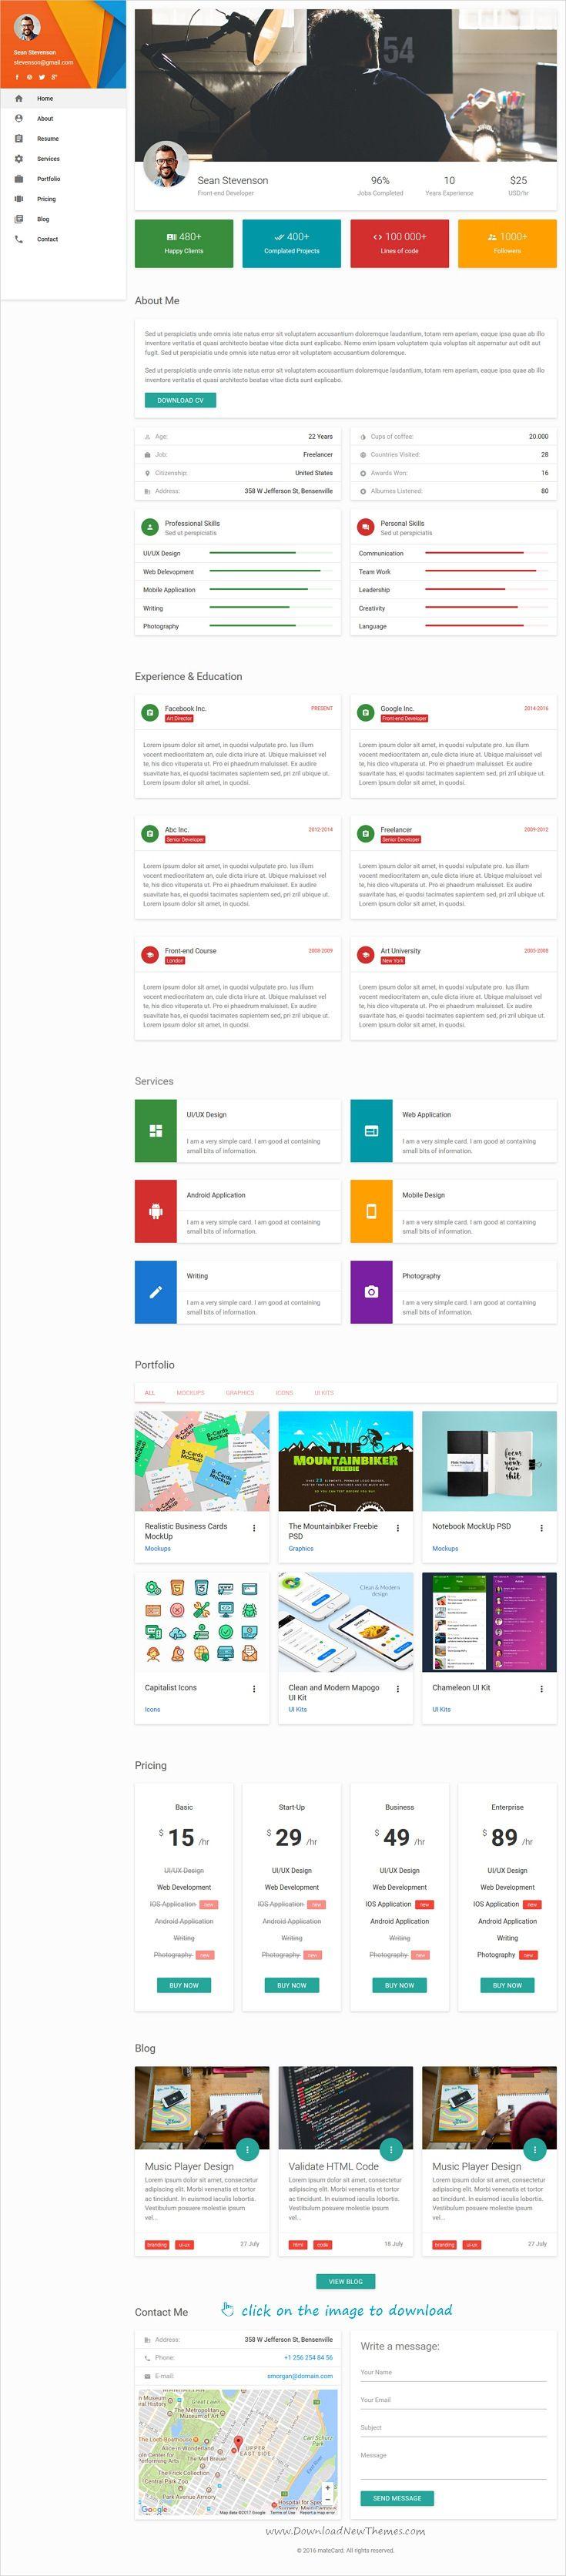 Großzügig One Page Vcard Lebenslauf Portfolio Website Vorlage Fotos ...